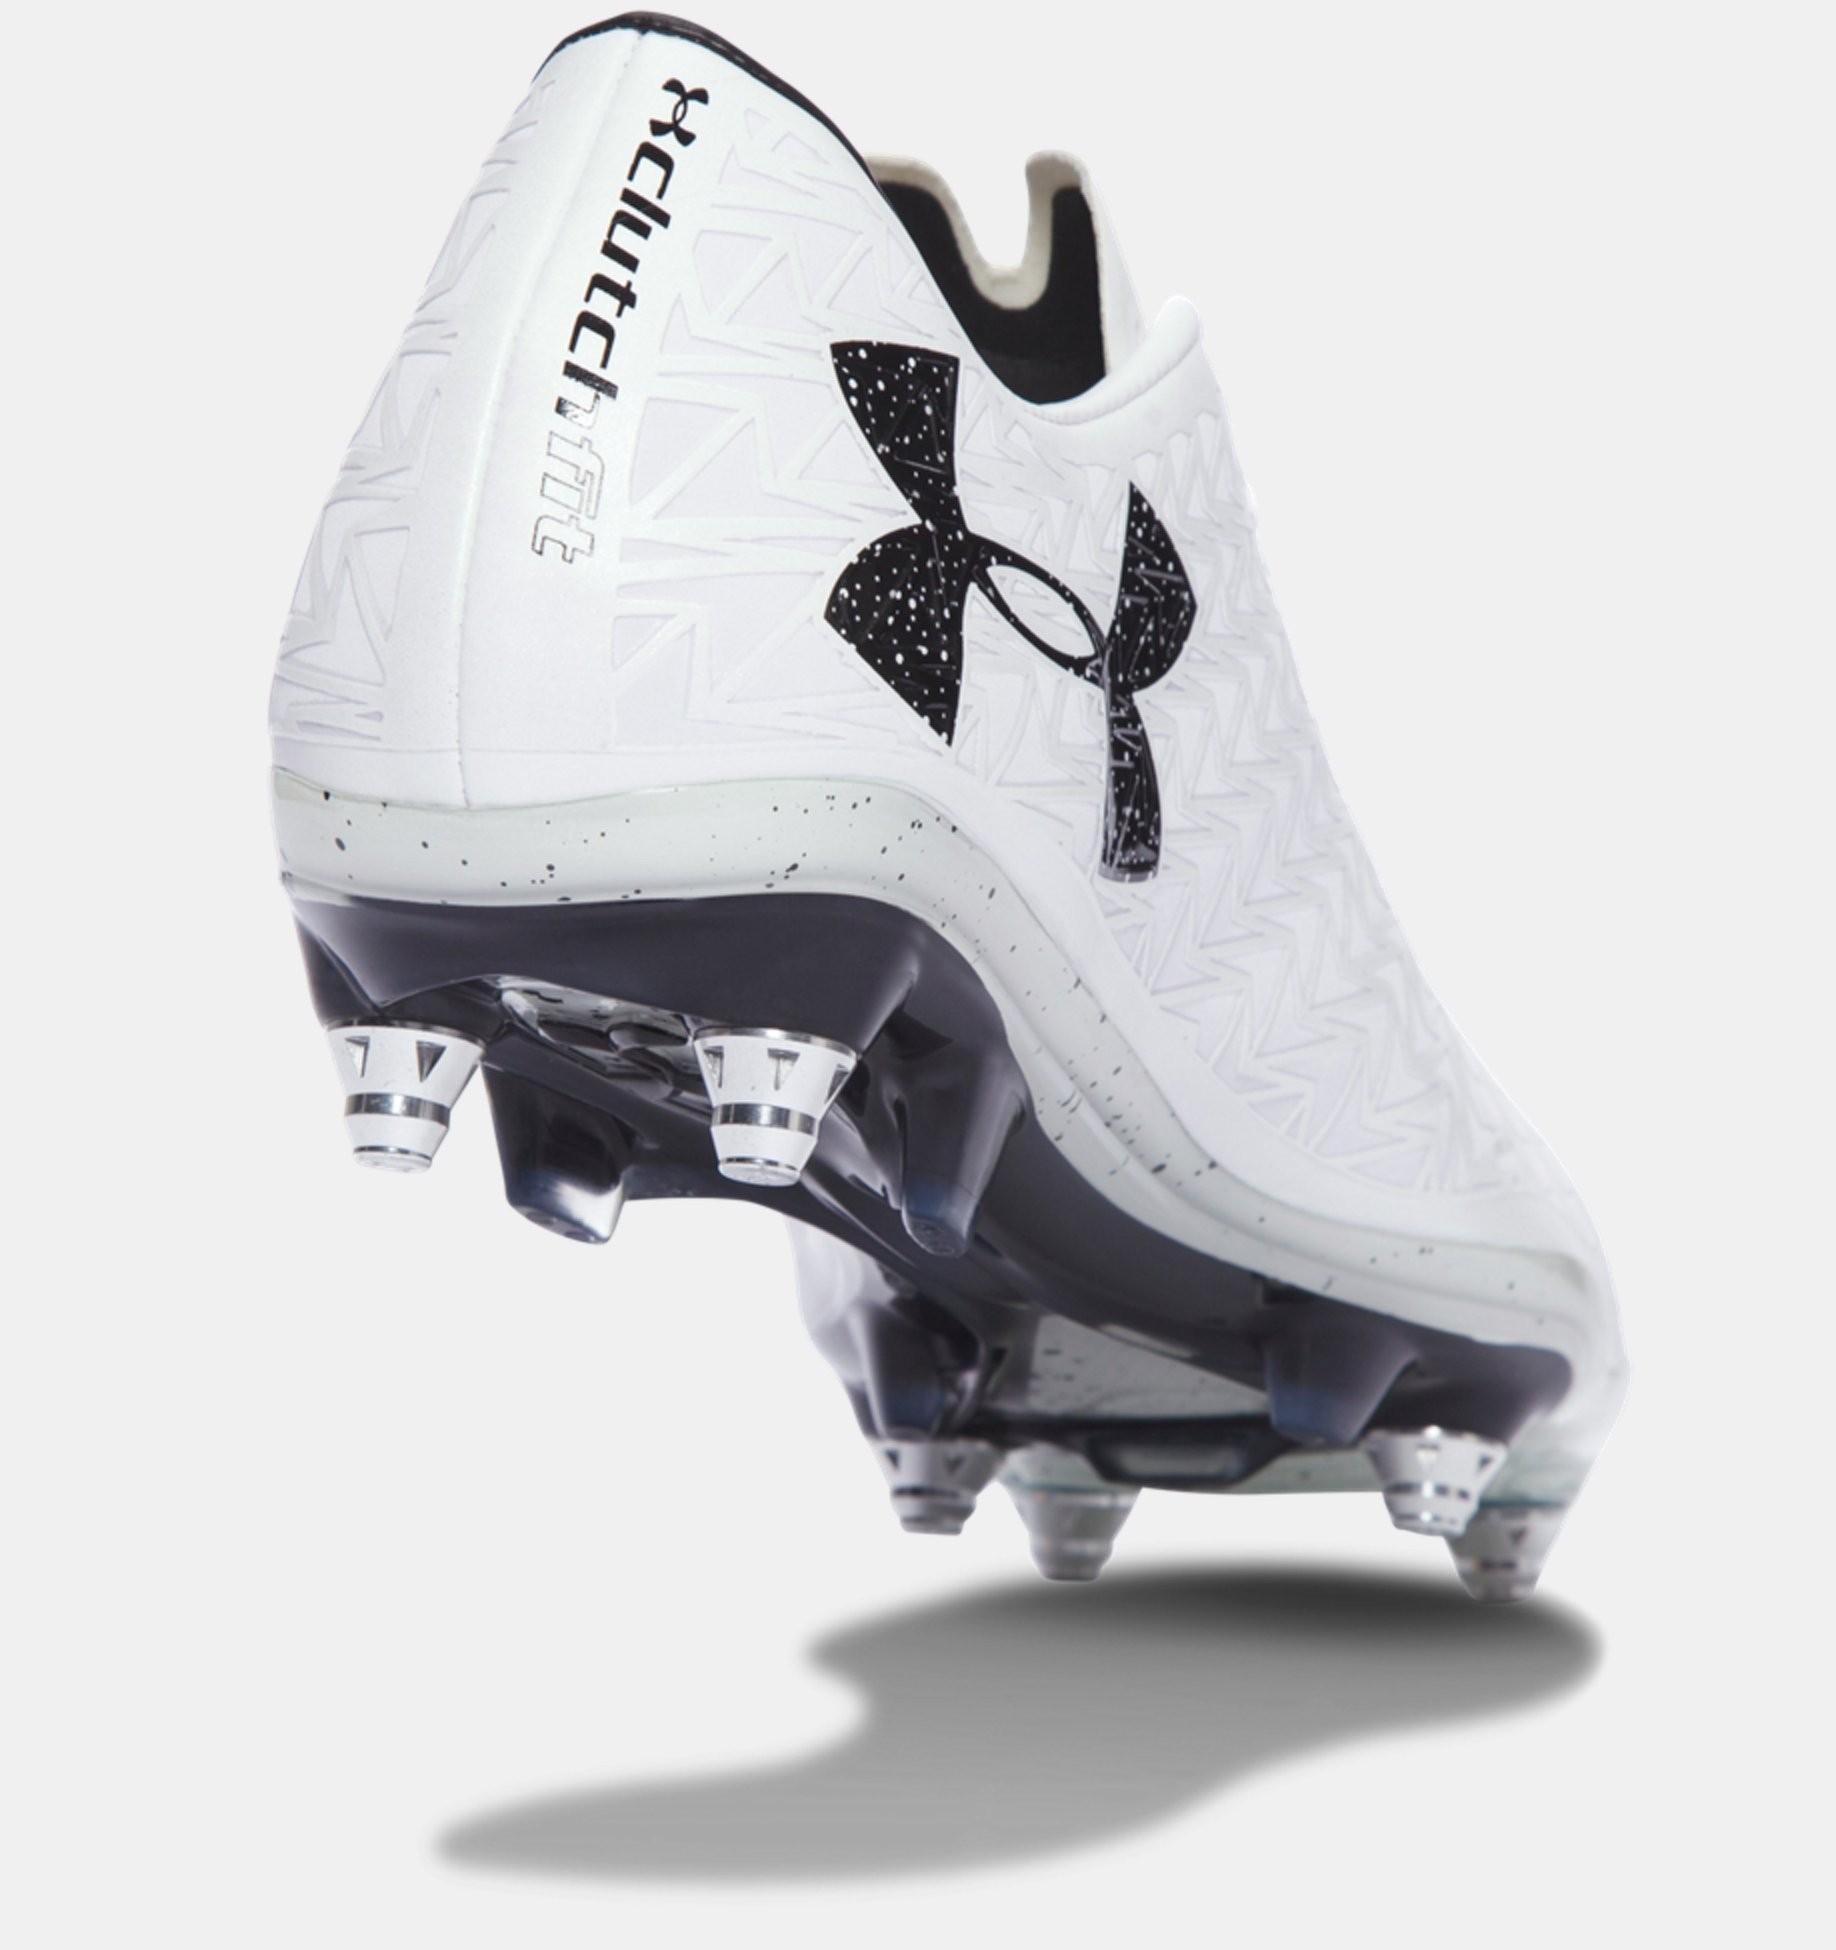 ... Botas de fútbol híbrido Under Armour ClutchFit® Force 3.0 Hombre  Blancas (100) ... e194daf06e5bd